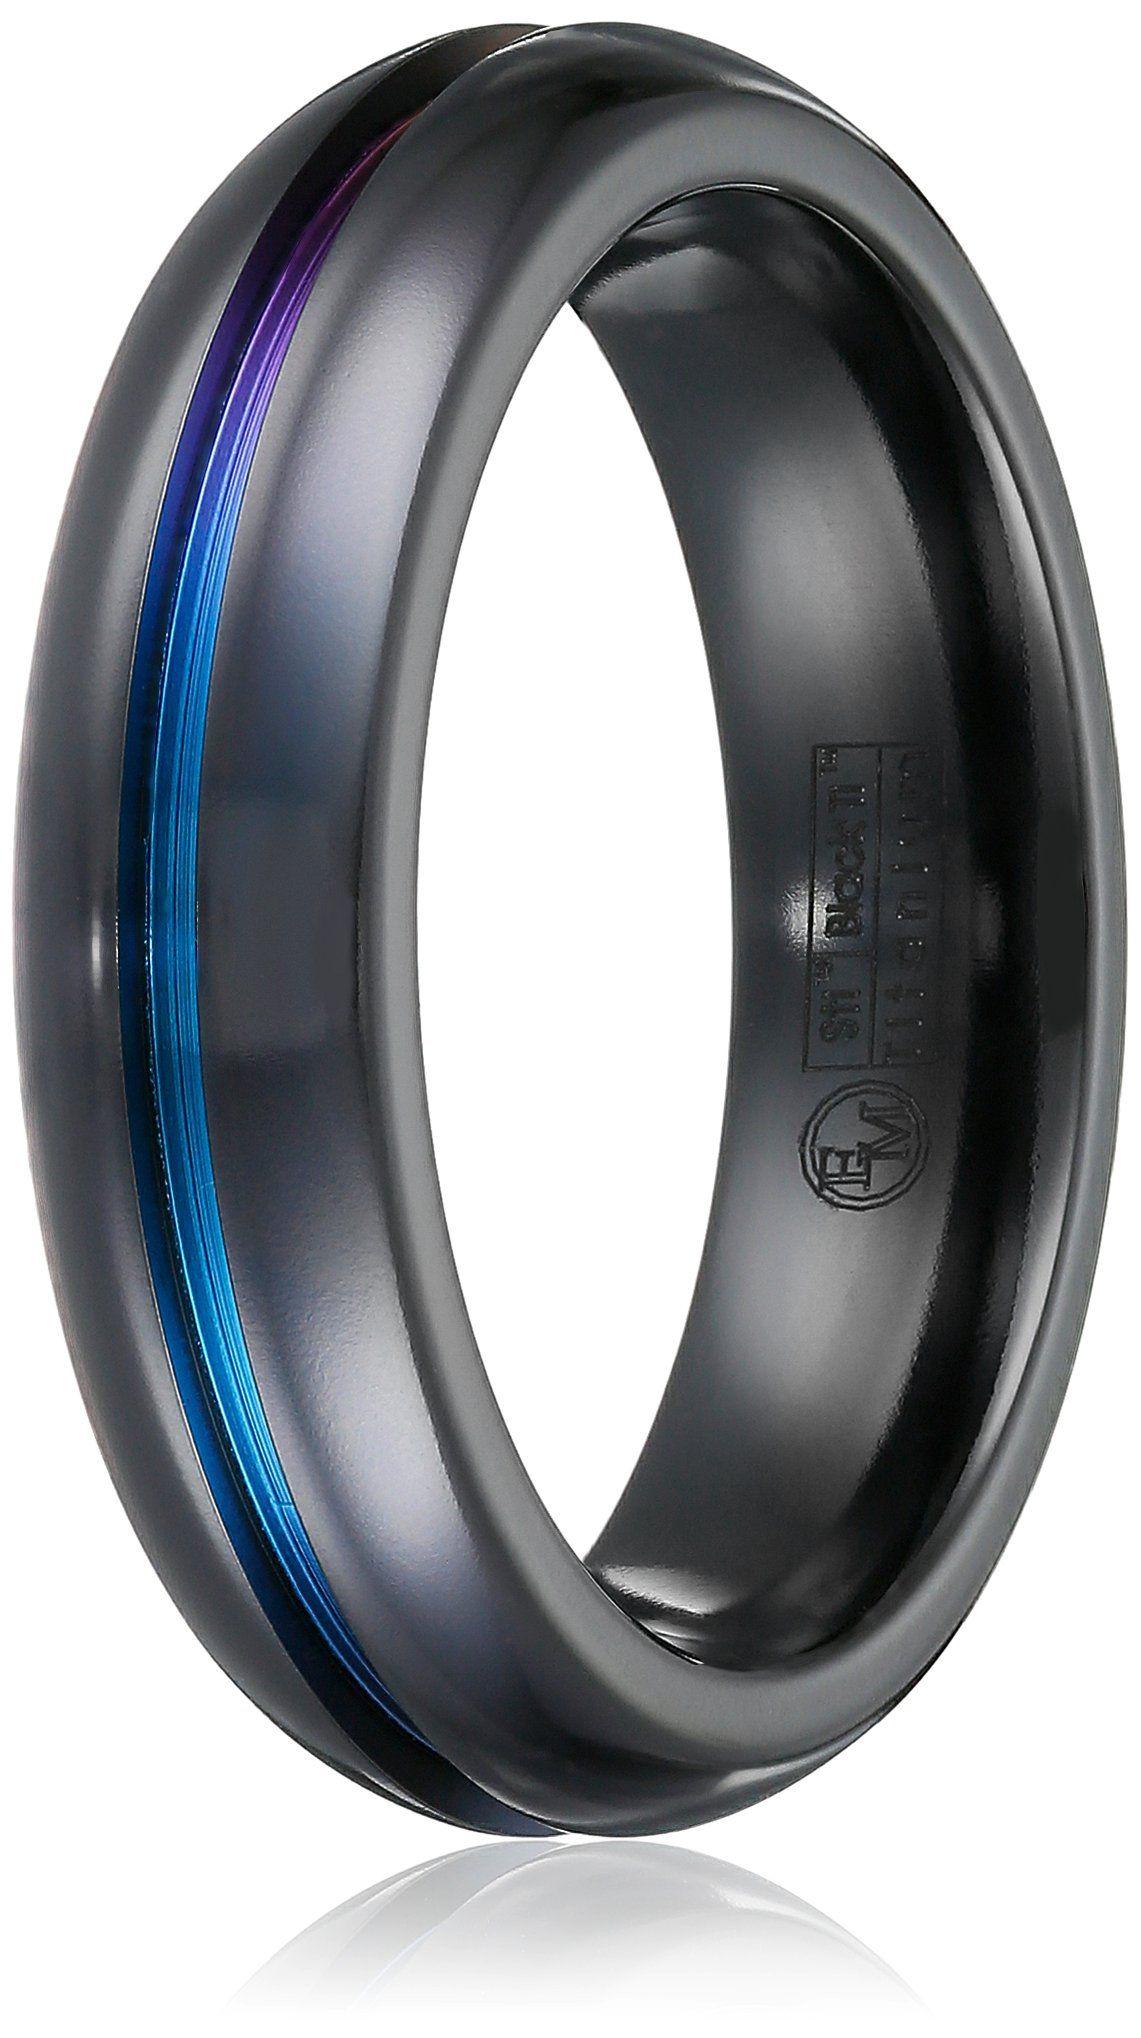 Men's Black Titanium Grooved Rainbow Dome Ring, Size 10.5